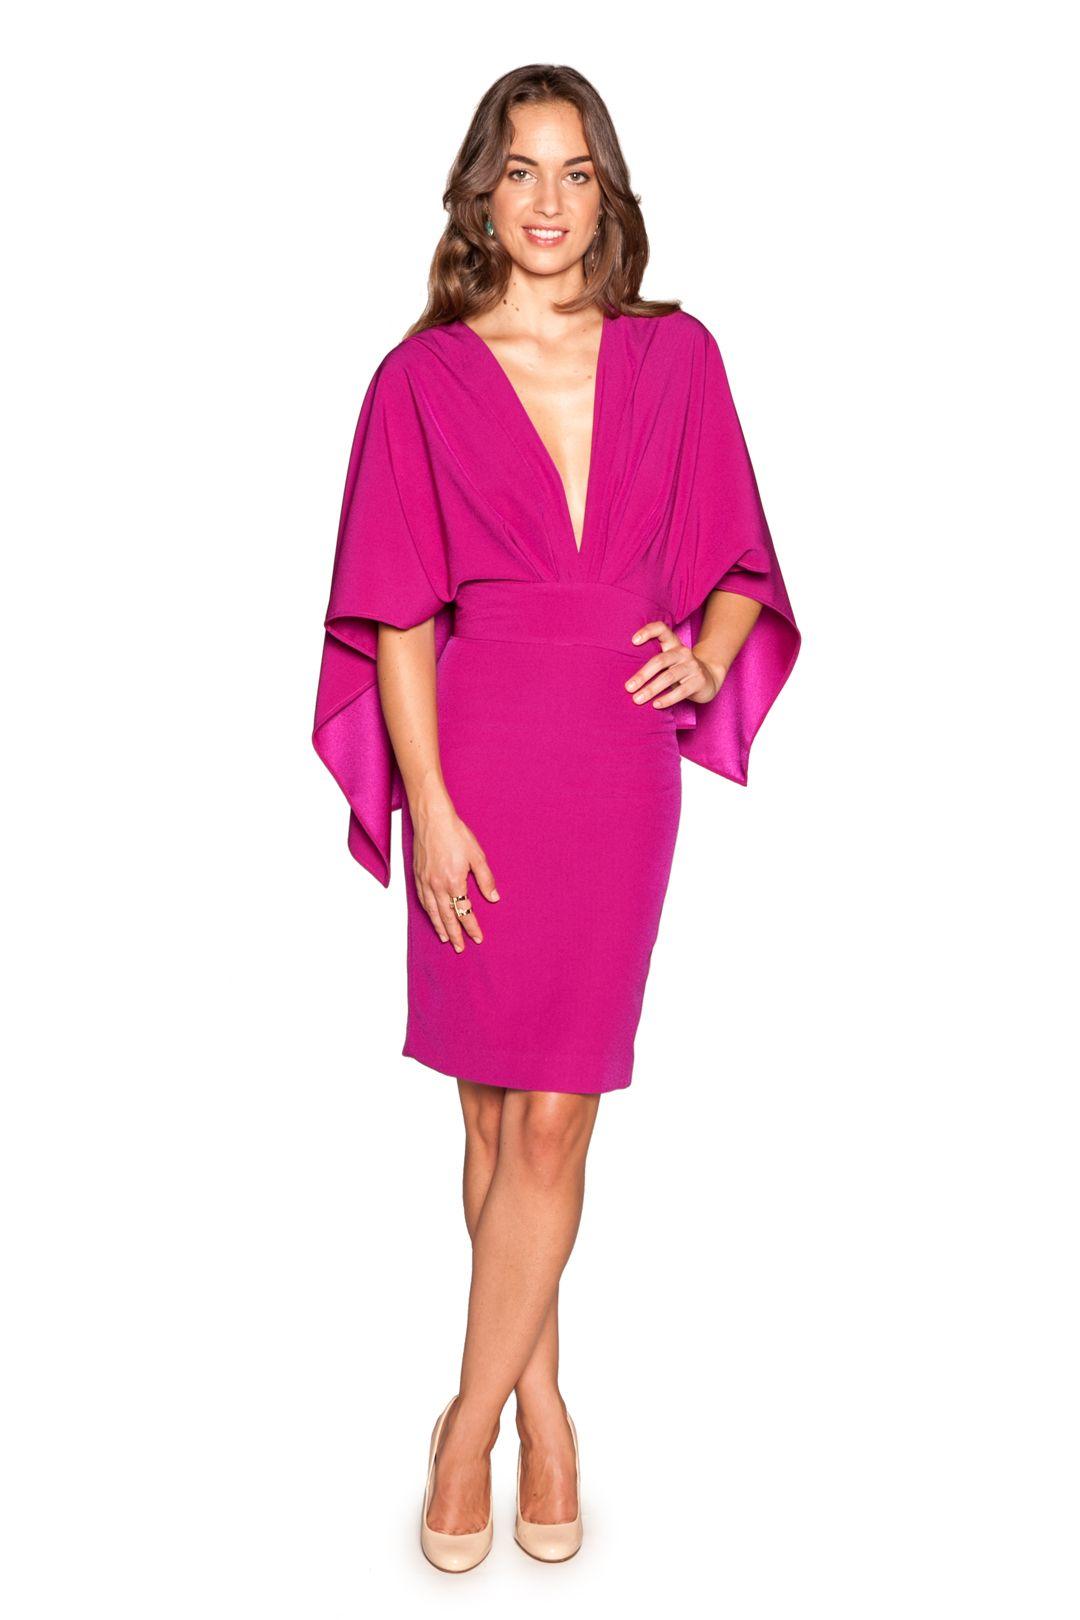 Pin de Pili Miralles en Invitadas   Pinterest   Alquiler de vestidos ...